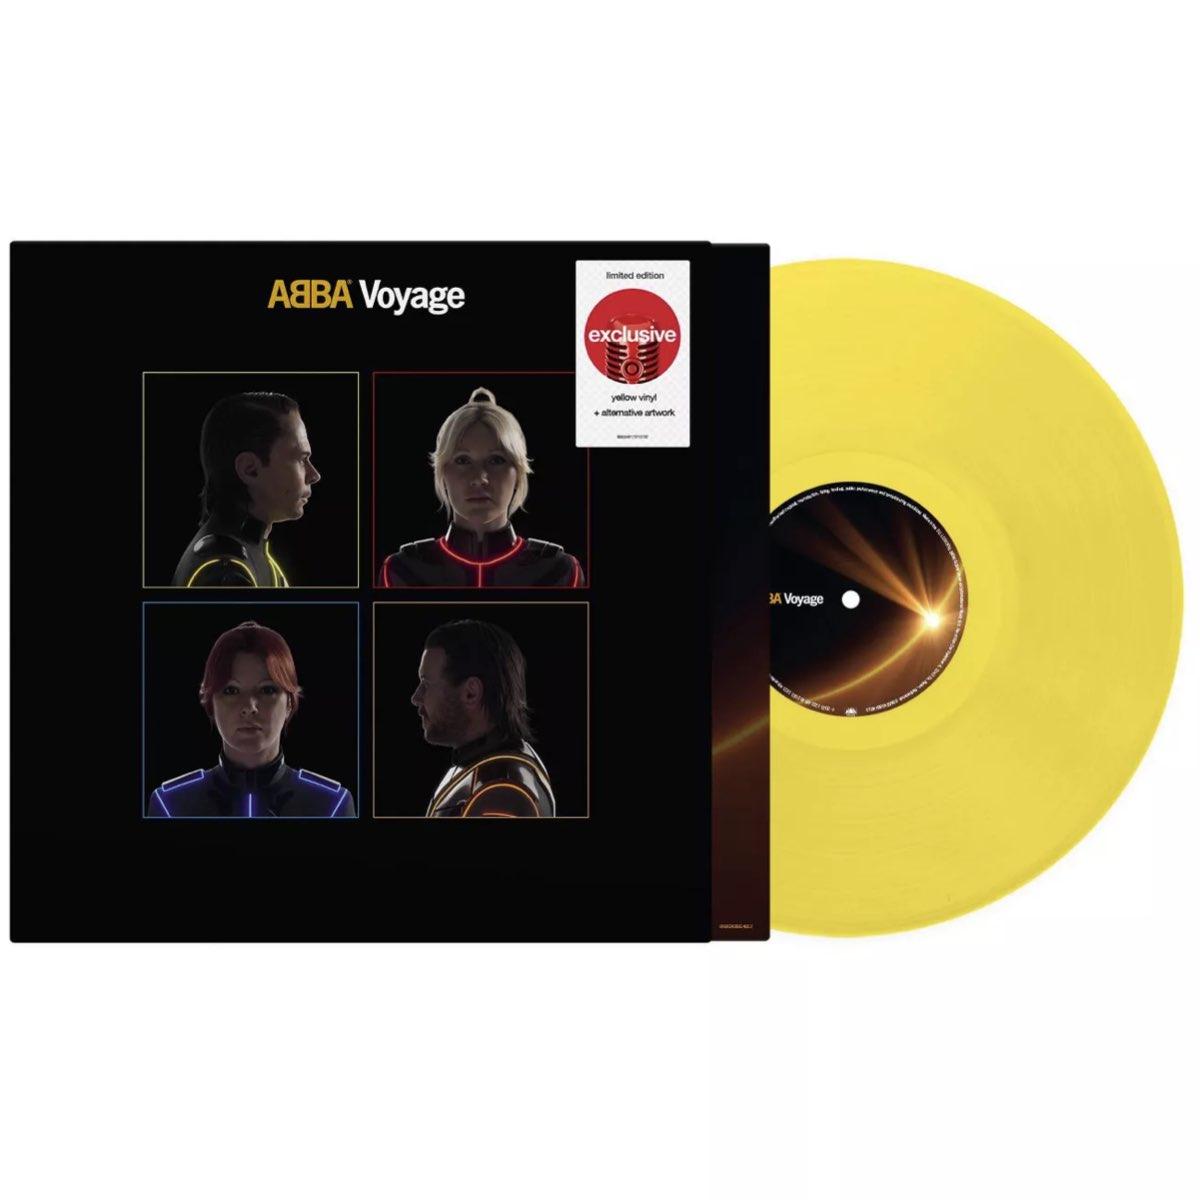 ABBA - Voyage [Target Exclusive] Yellow Vinyl